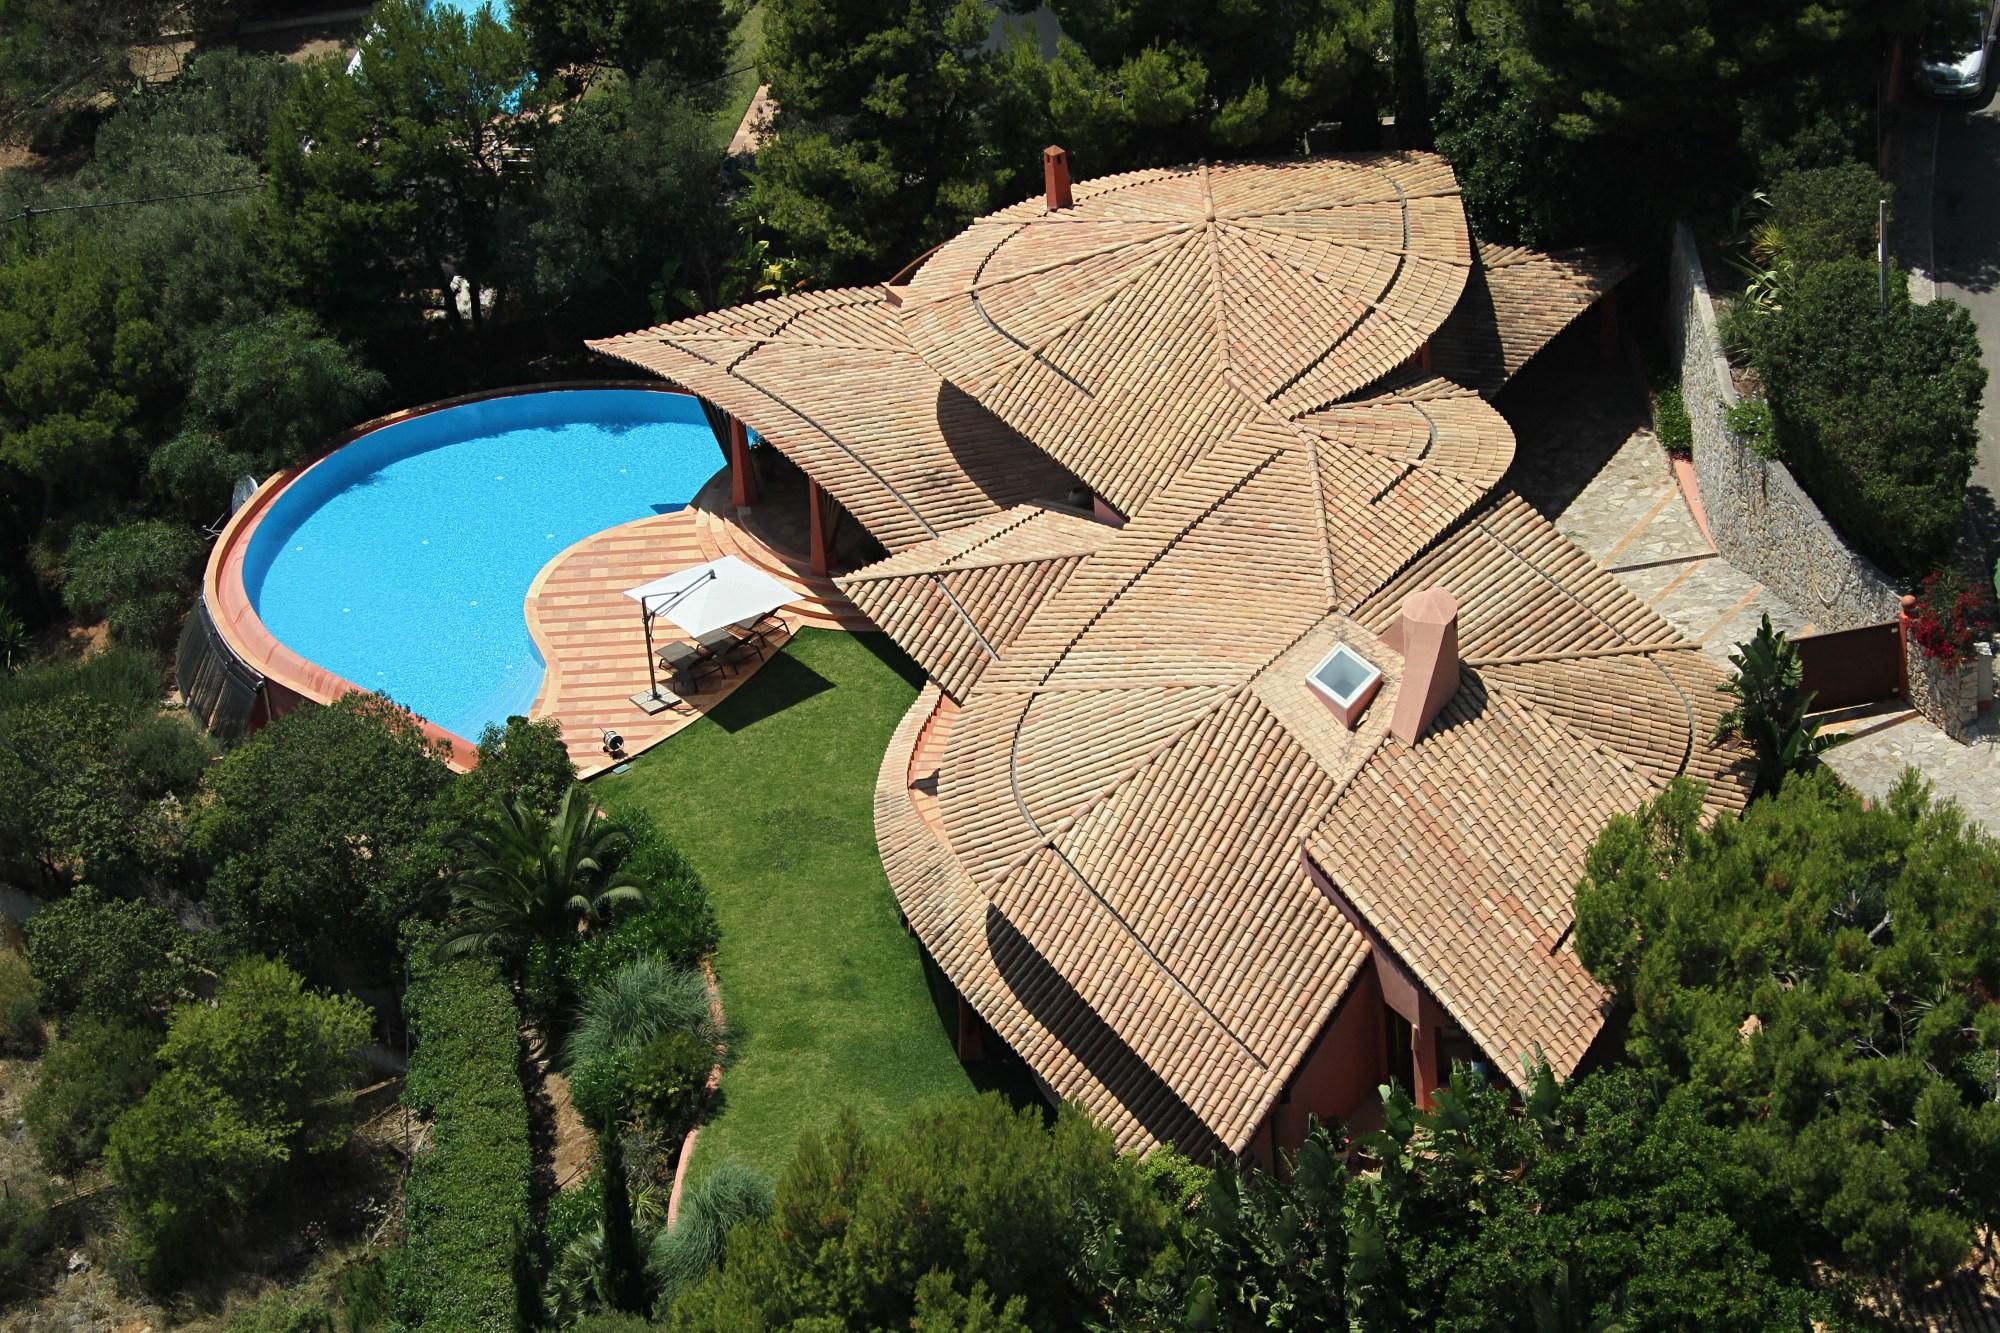 ARUB Aerials - Costa Blanes 01c.jpg